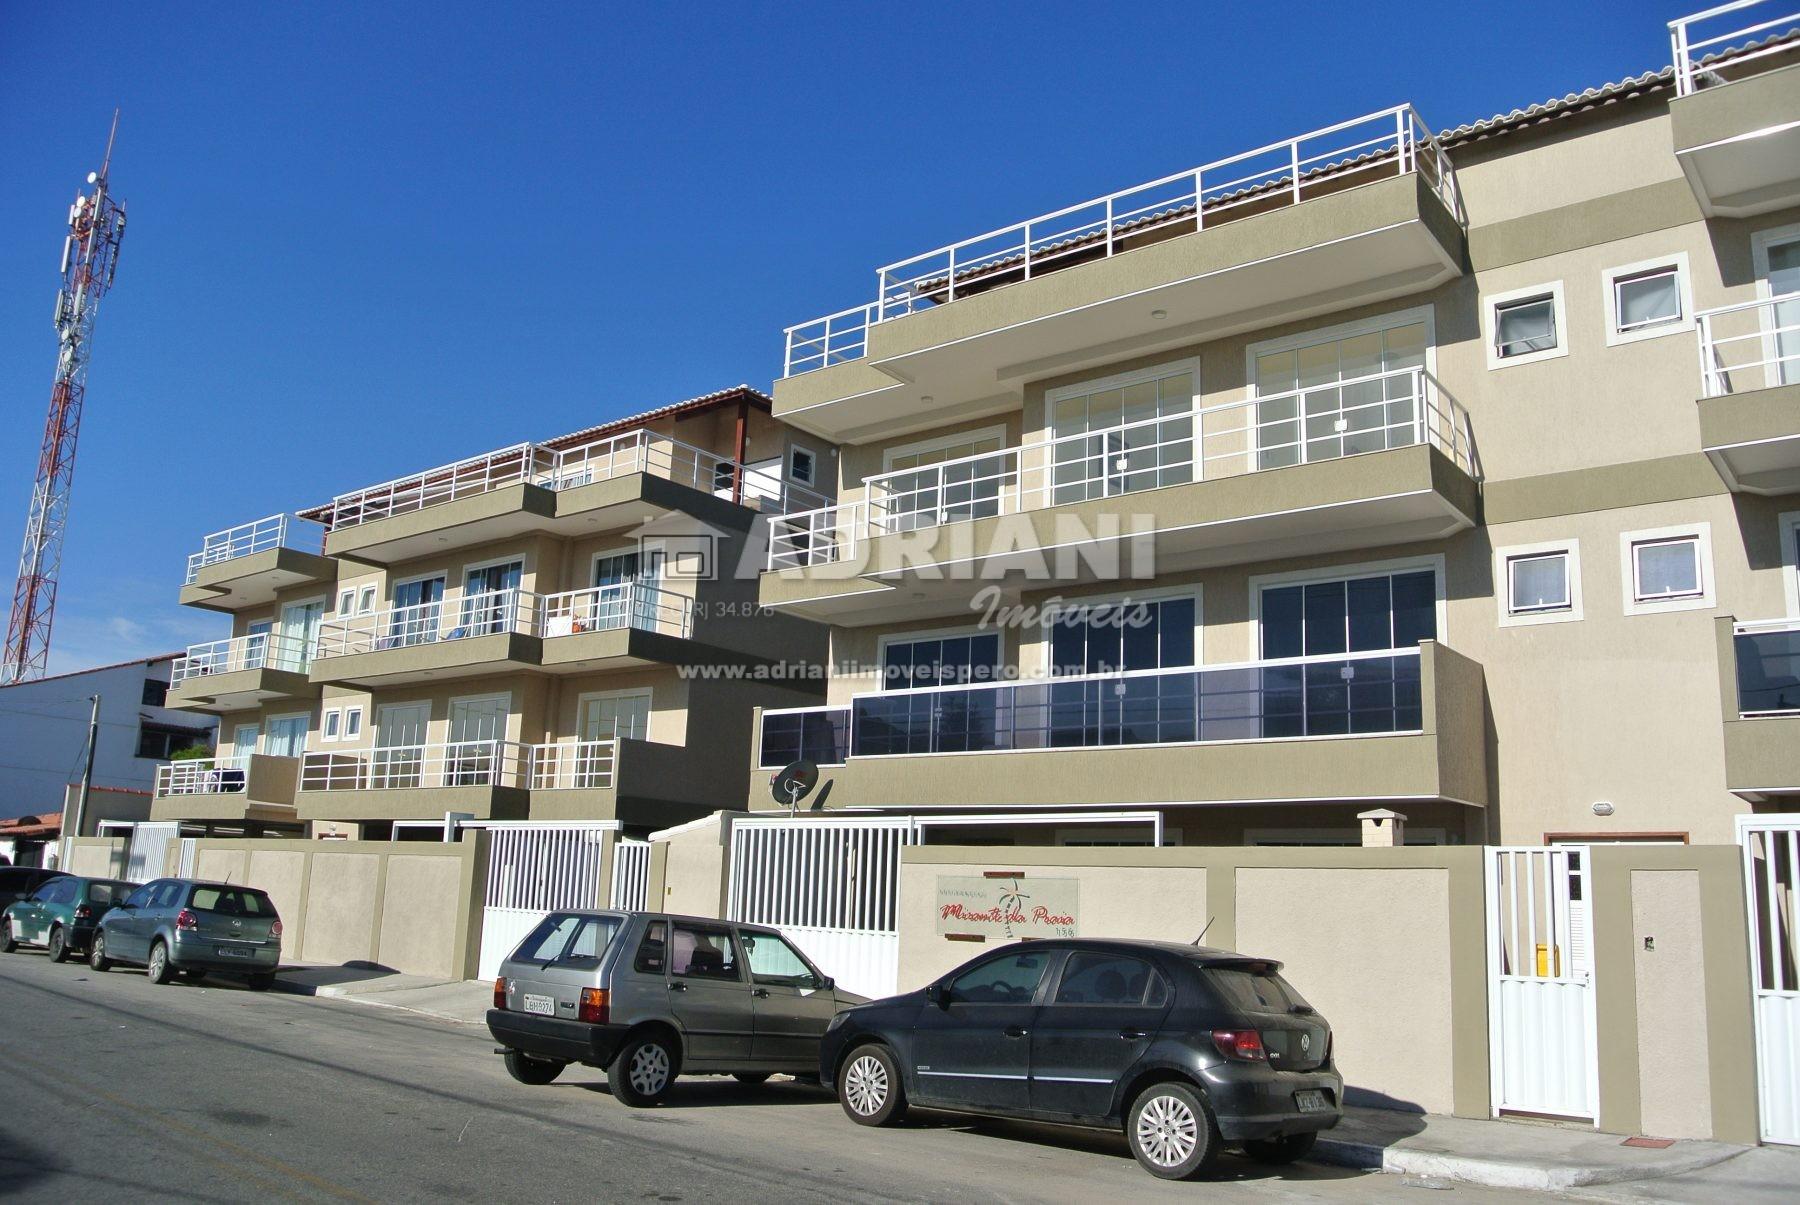 Cód 404 Apartamento, 1 suíte,temporada,Peró, Cabo Frio – RJ